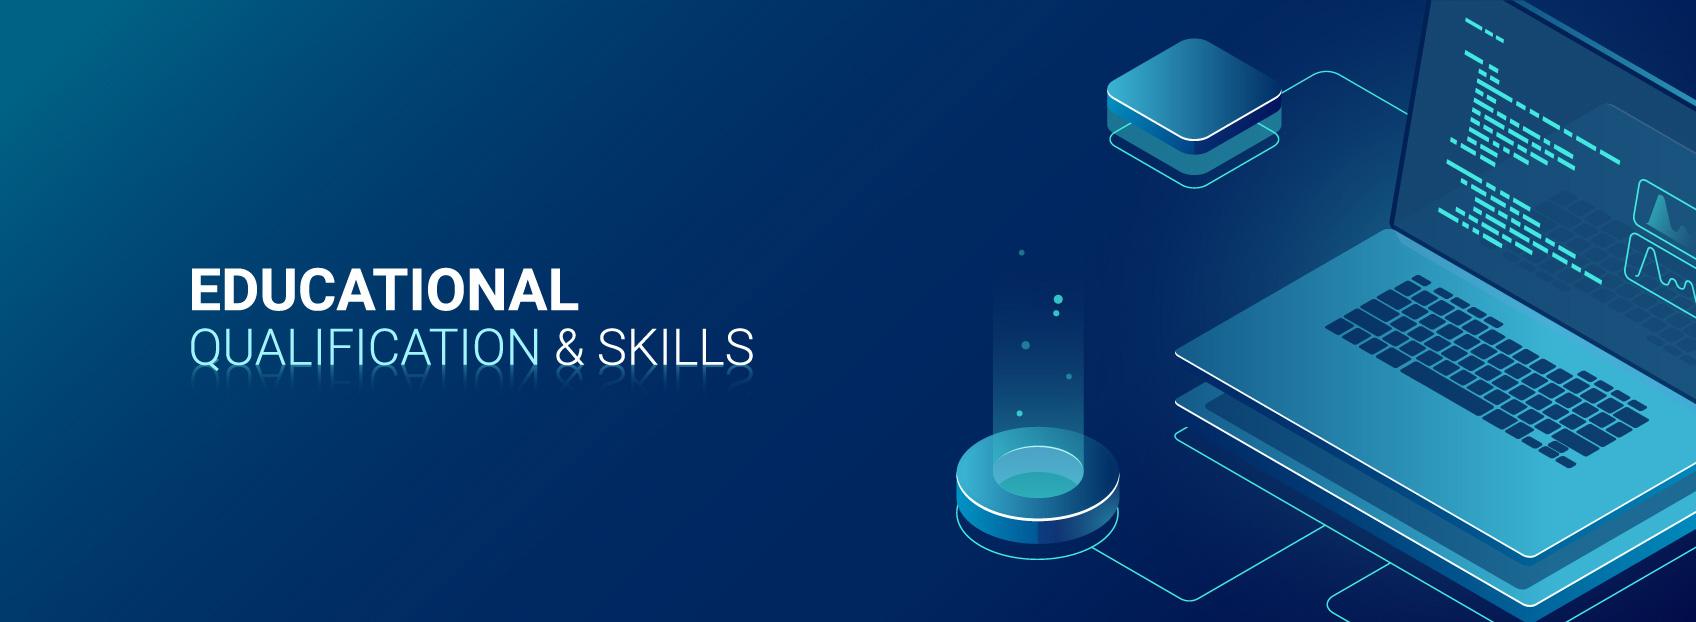 Educational Qualification & Skills